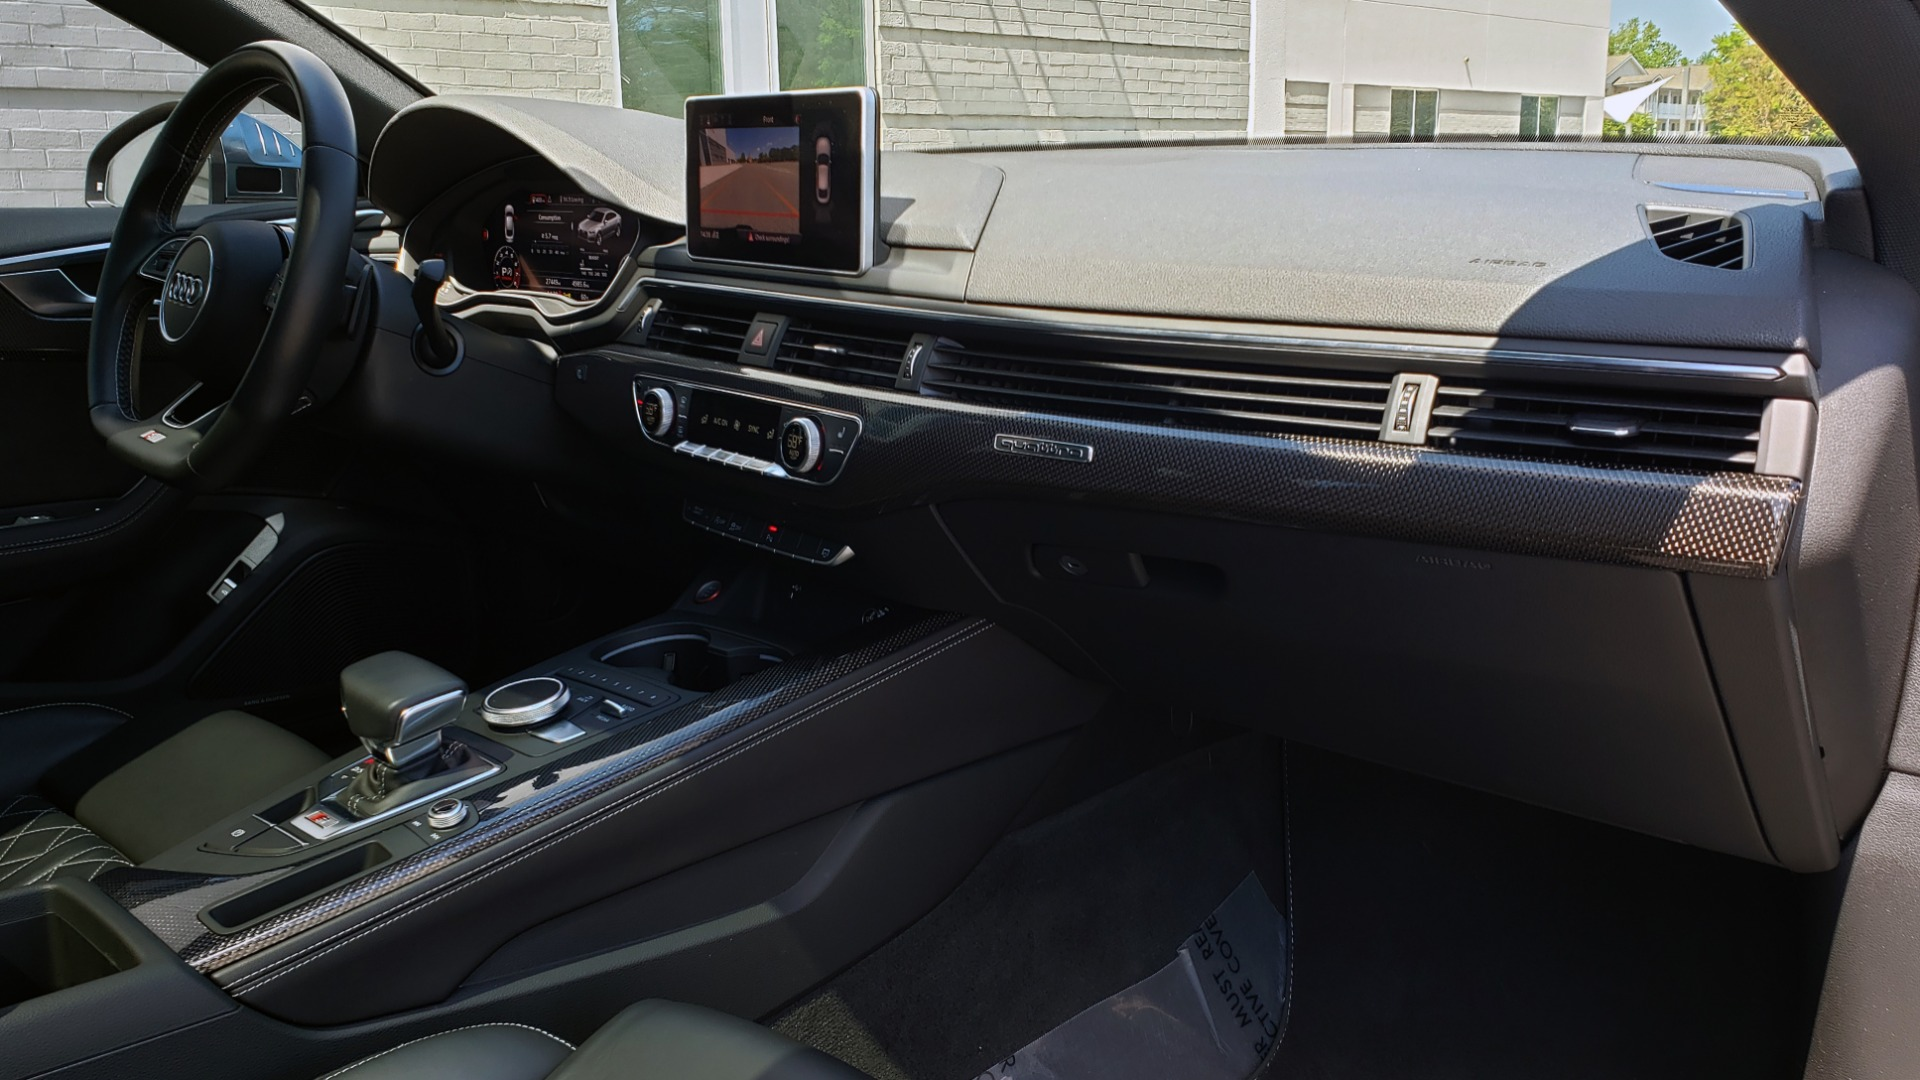 Used 2018 Audi S5 SPORTBACK PRESTIGE S-SPORT / NAV / SUNROOF / HUD / B&O SND / REARVIEW for sale $48,995 at Formula Imports in Charlotte NC 28227 58